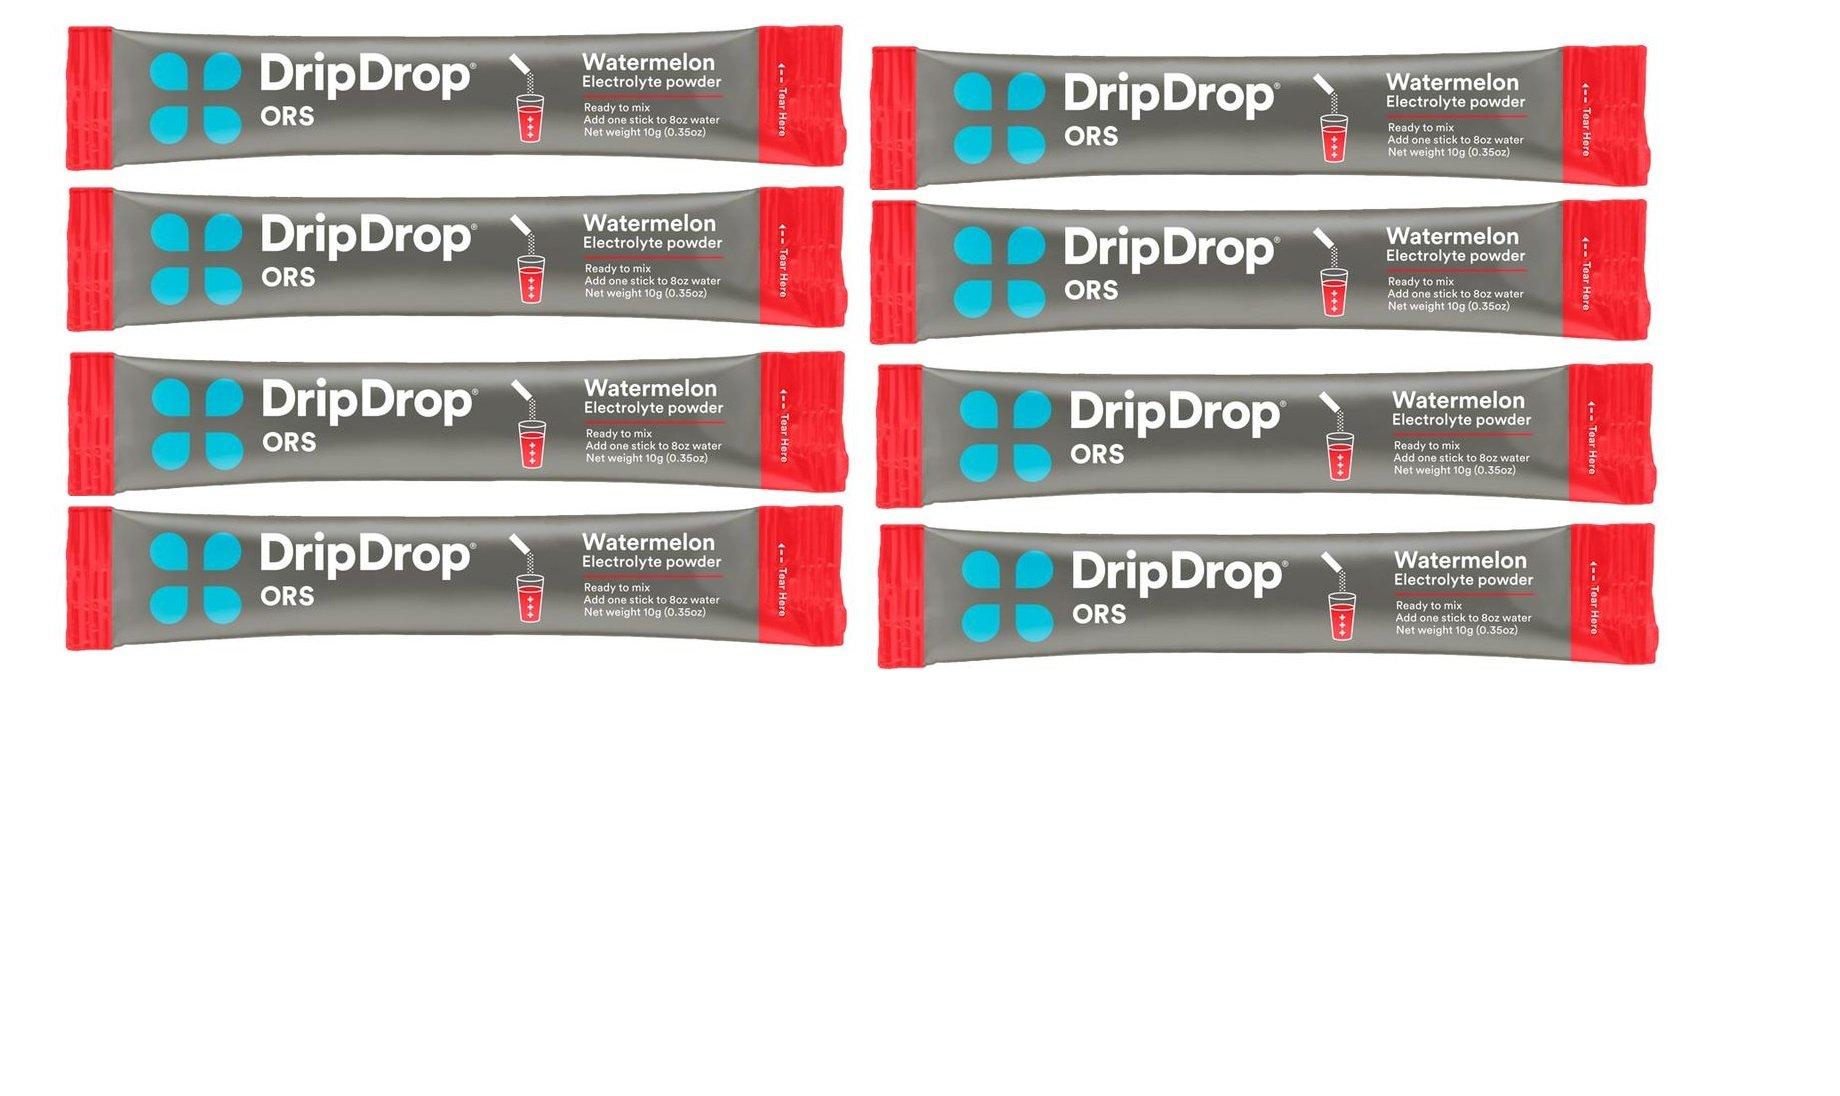 DripDrop ORS Hydration Powder, Watermelon, 8 Powder Sticks Per Box (5 Pack)